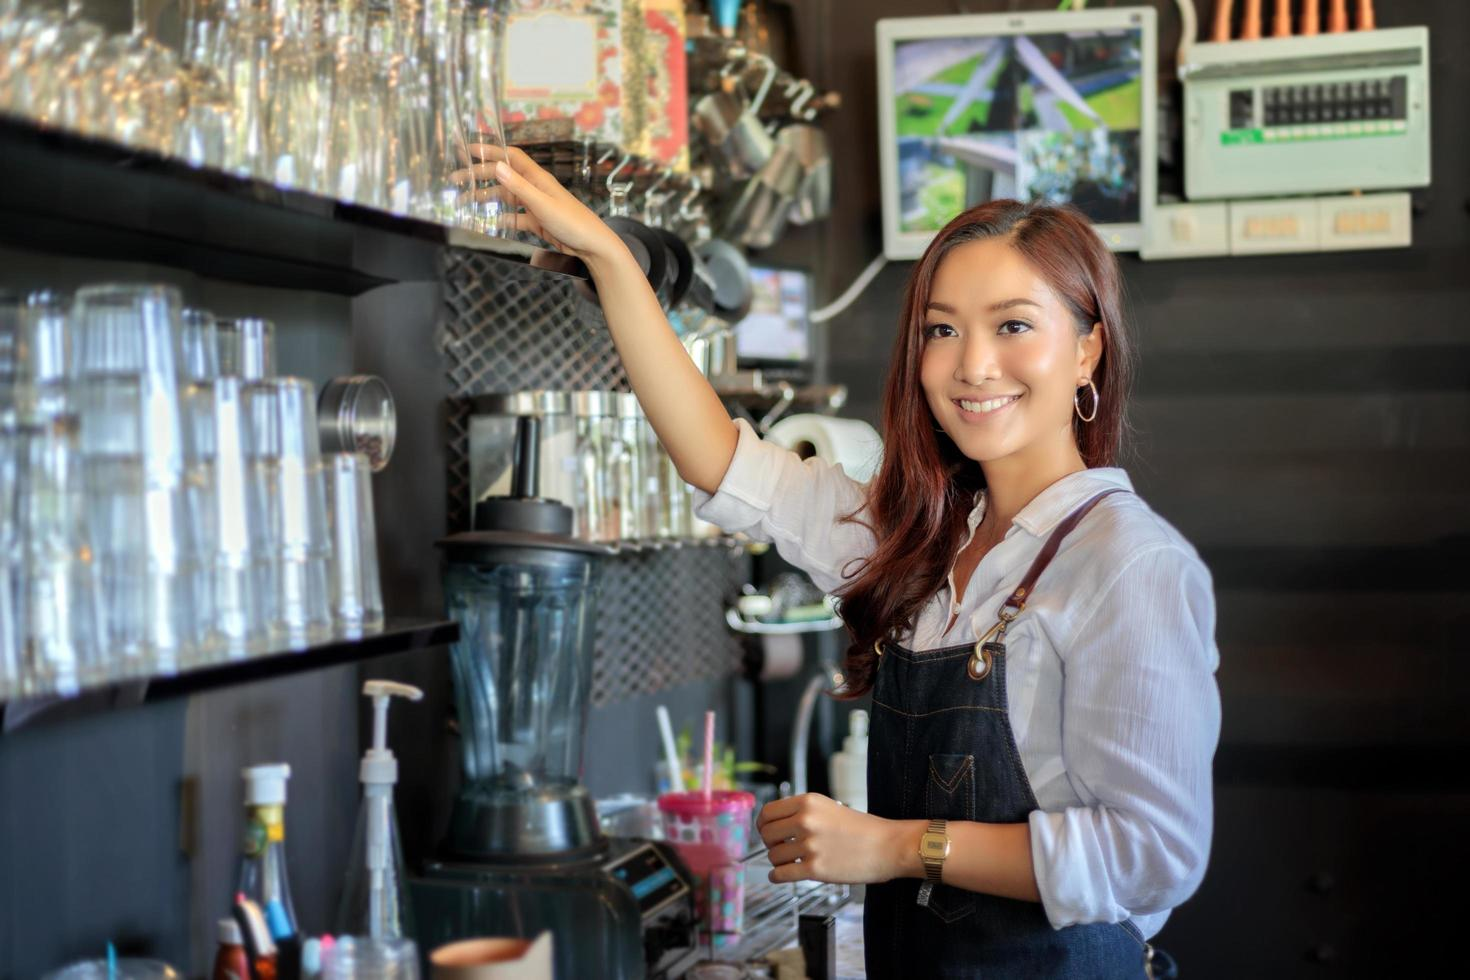 Female Asian barista smiling while using coffee machine photo